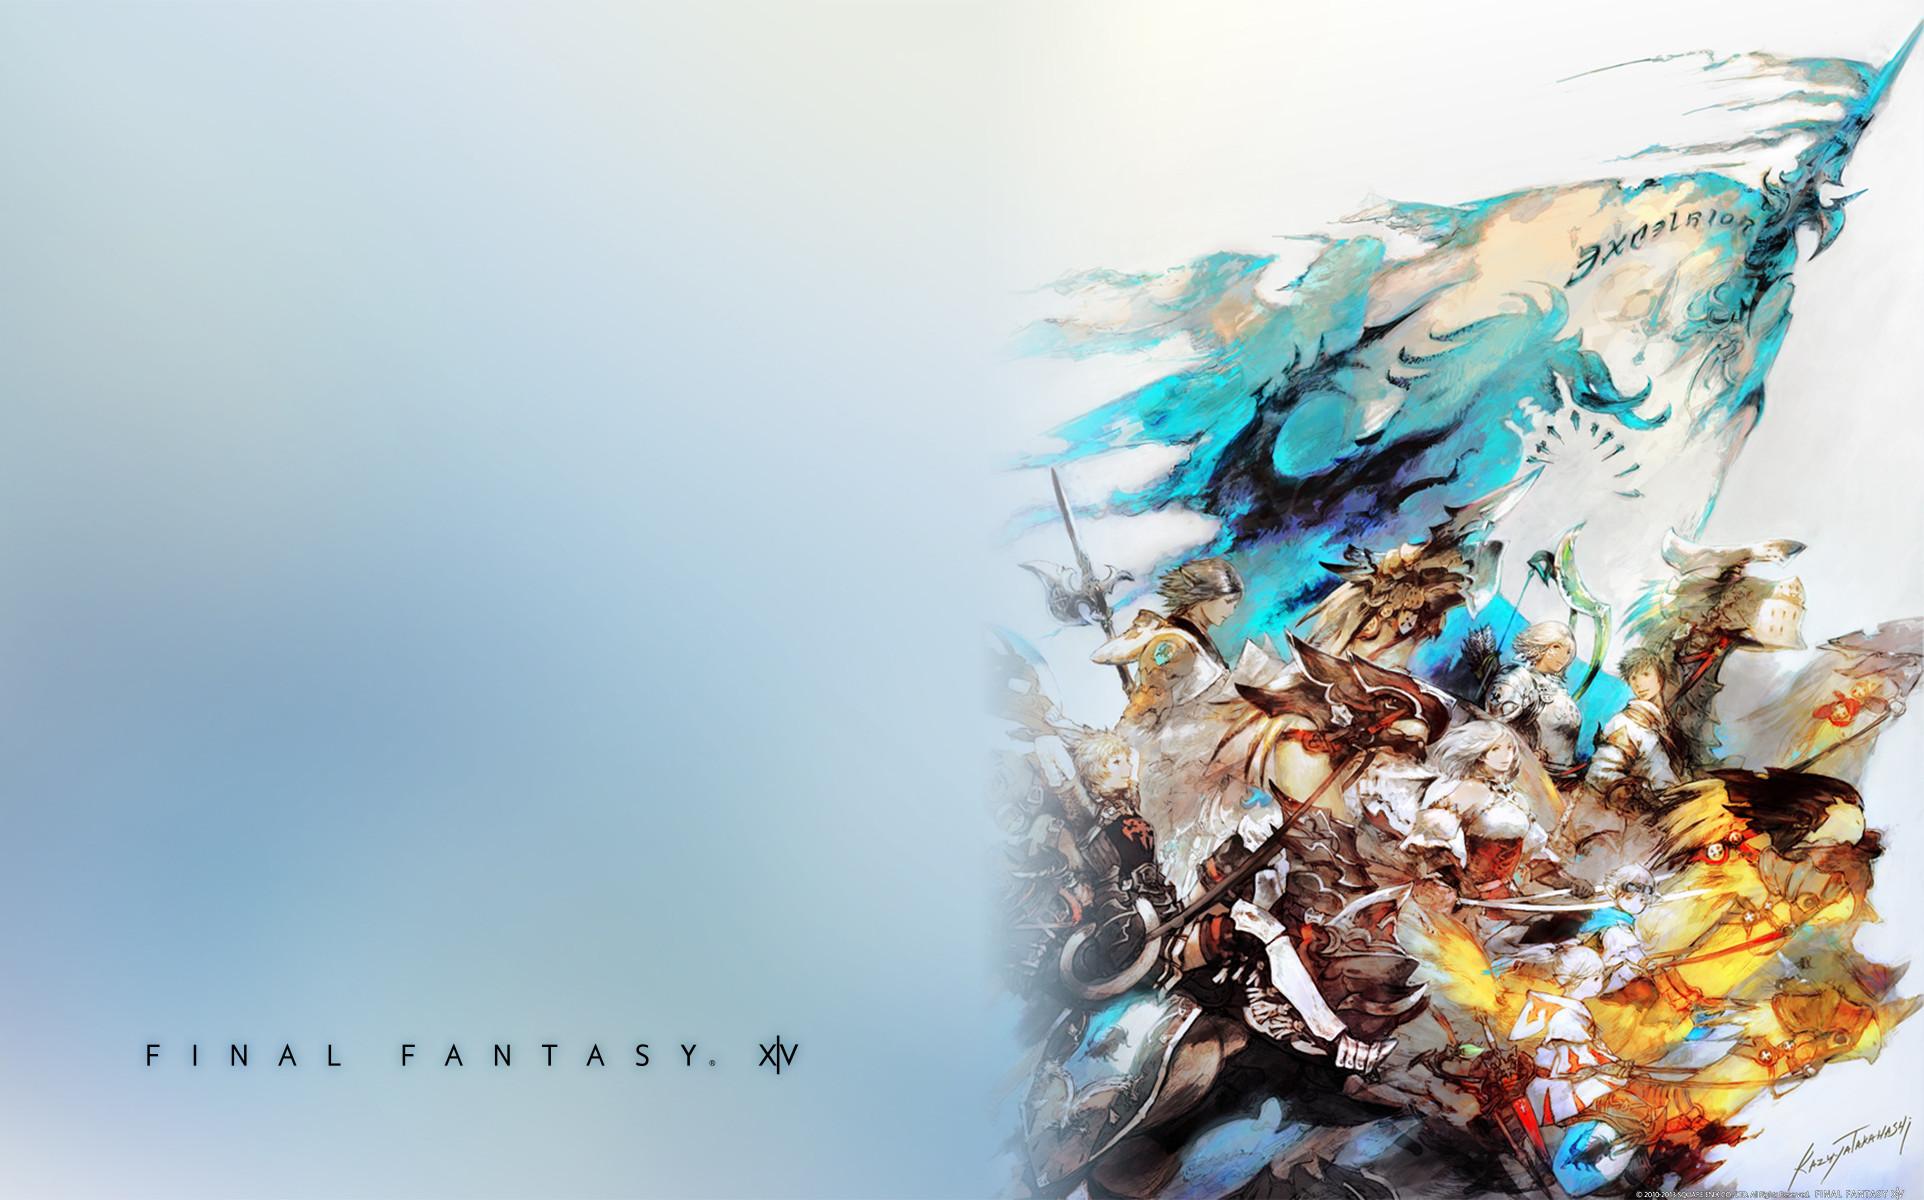 1924x1200 Final Fantasy XIV A Realm Reborn Wallpaper The